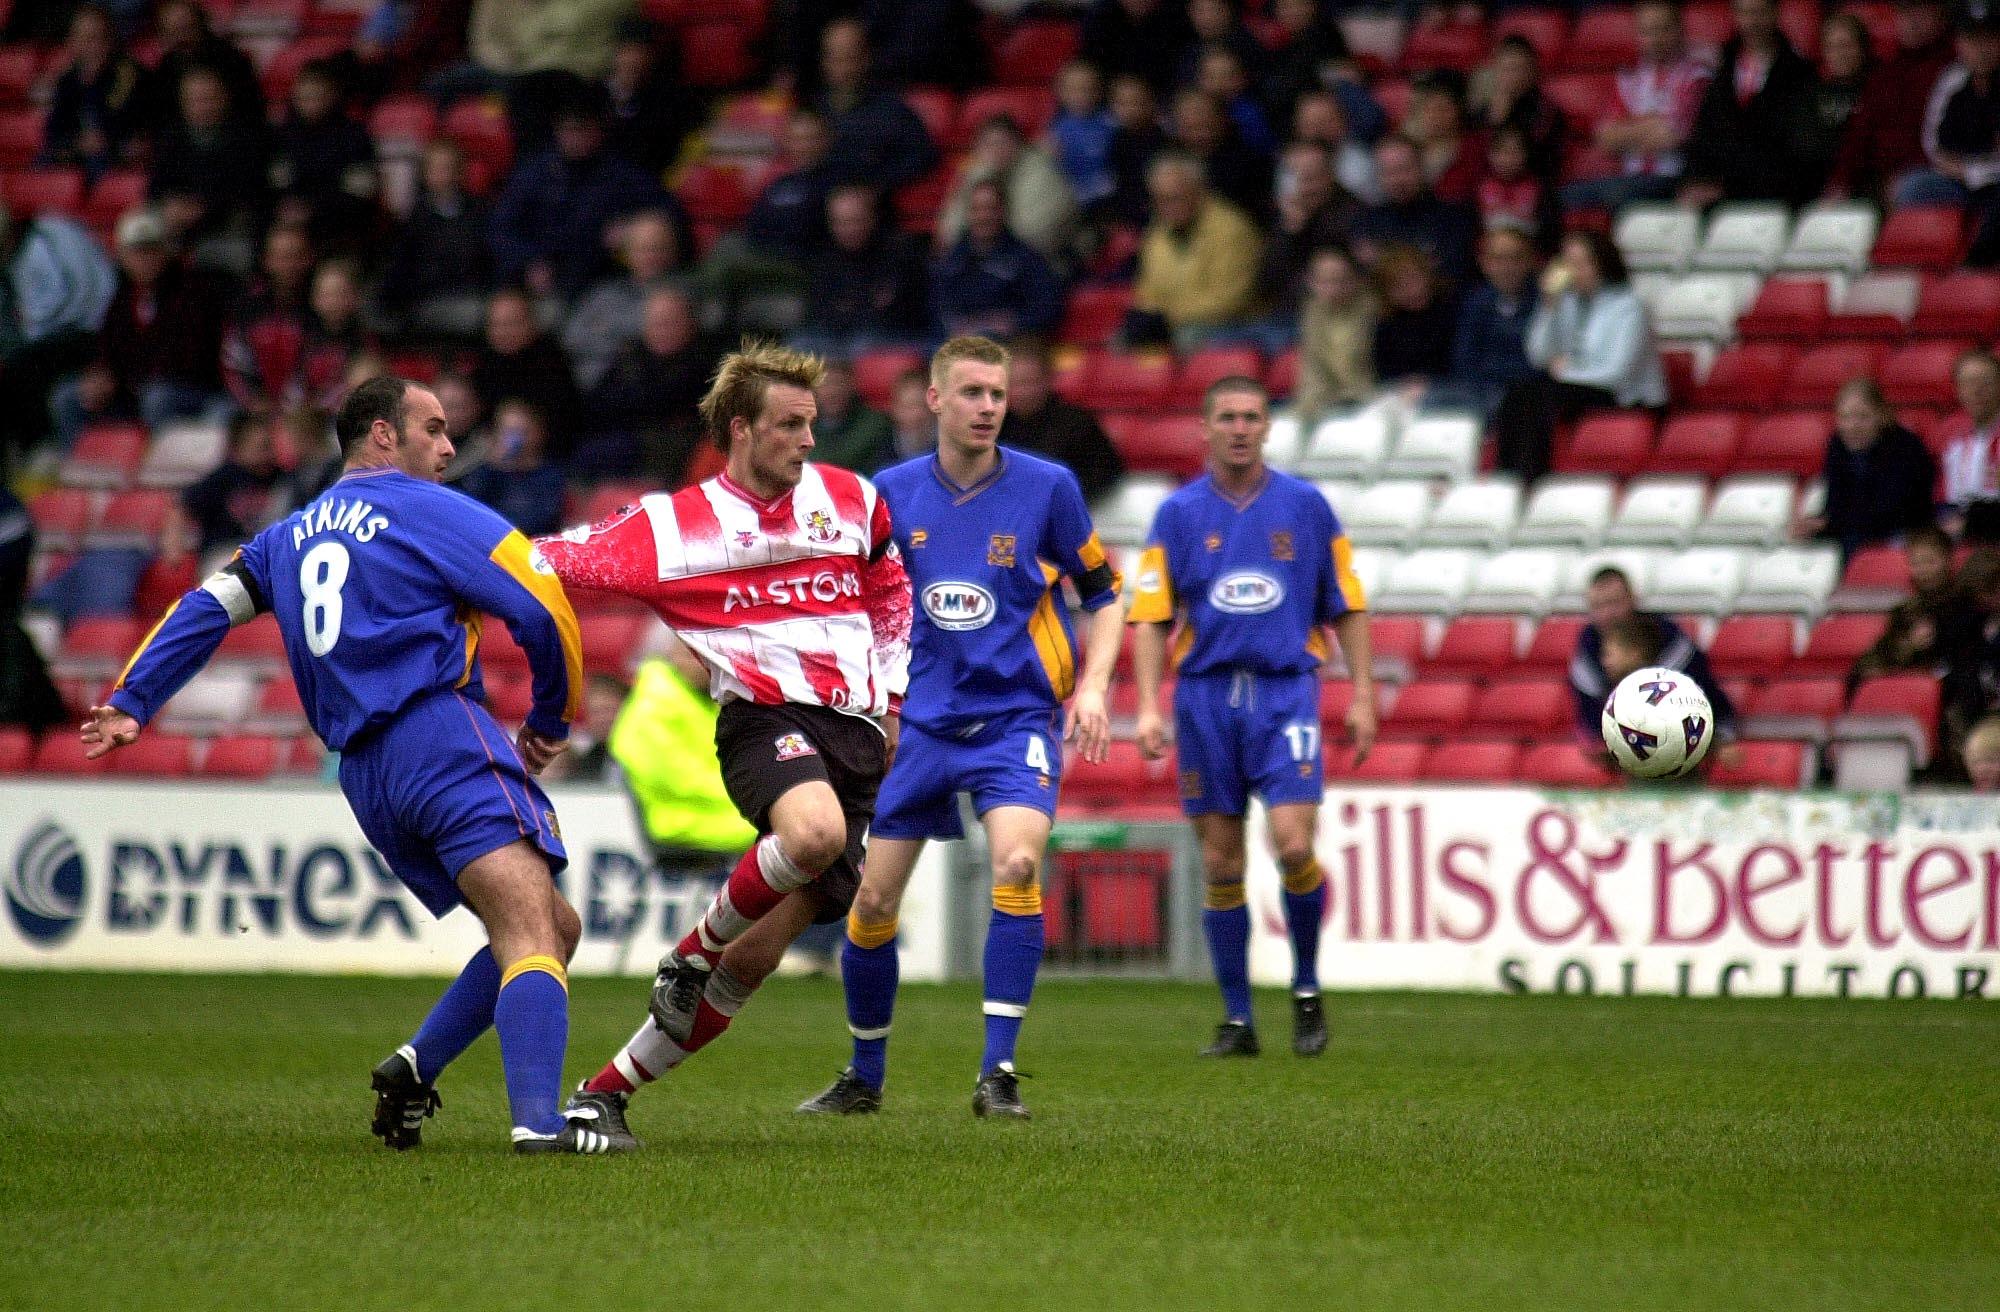 Lincoln City Vs Shrewsbury Town